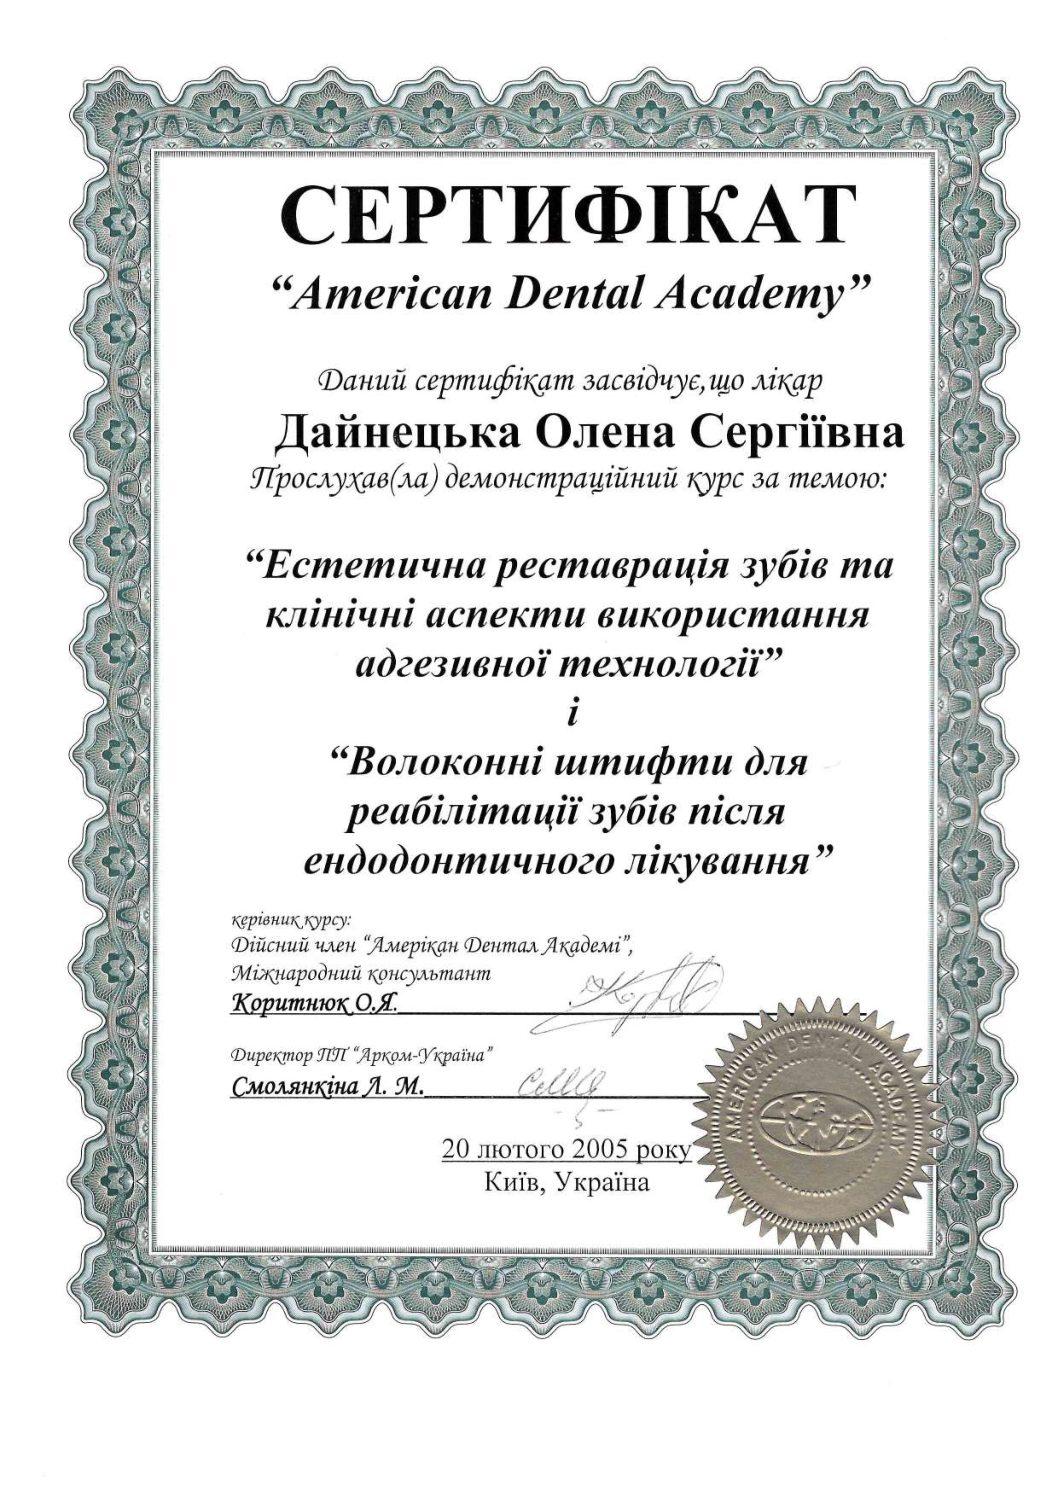 Untitled.FR16.tif compressed pdf - Олена Дайнецька